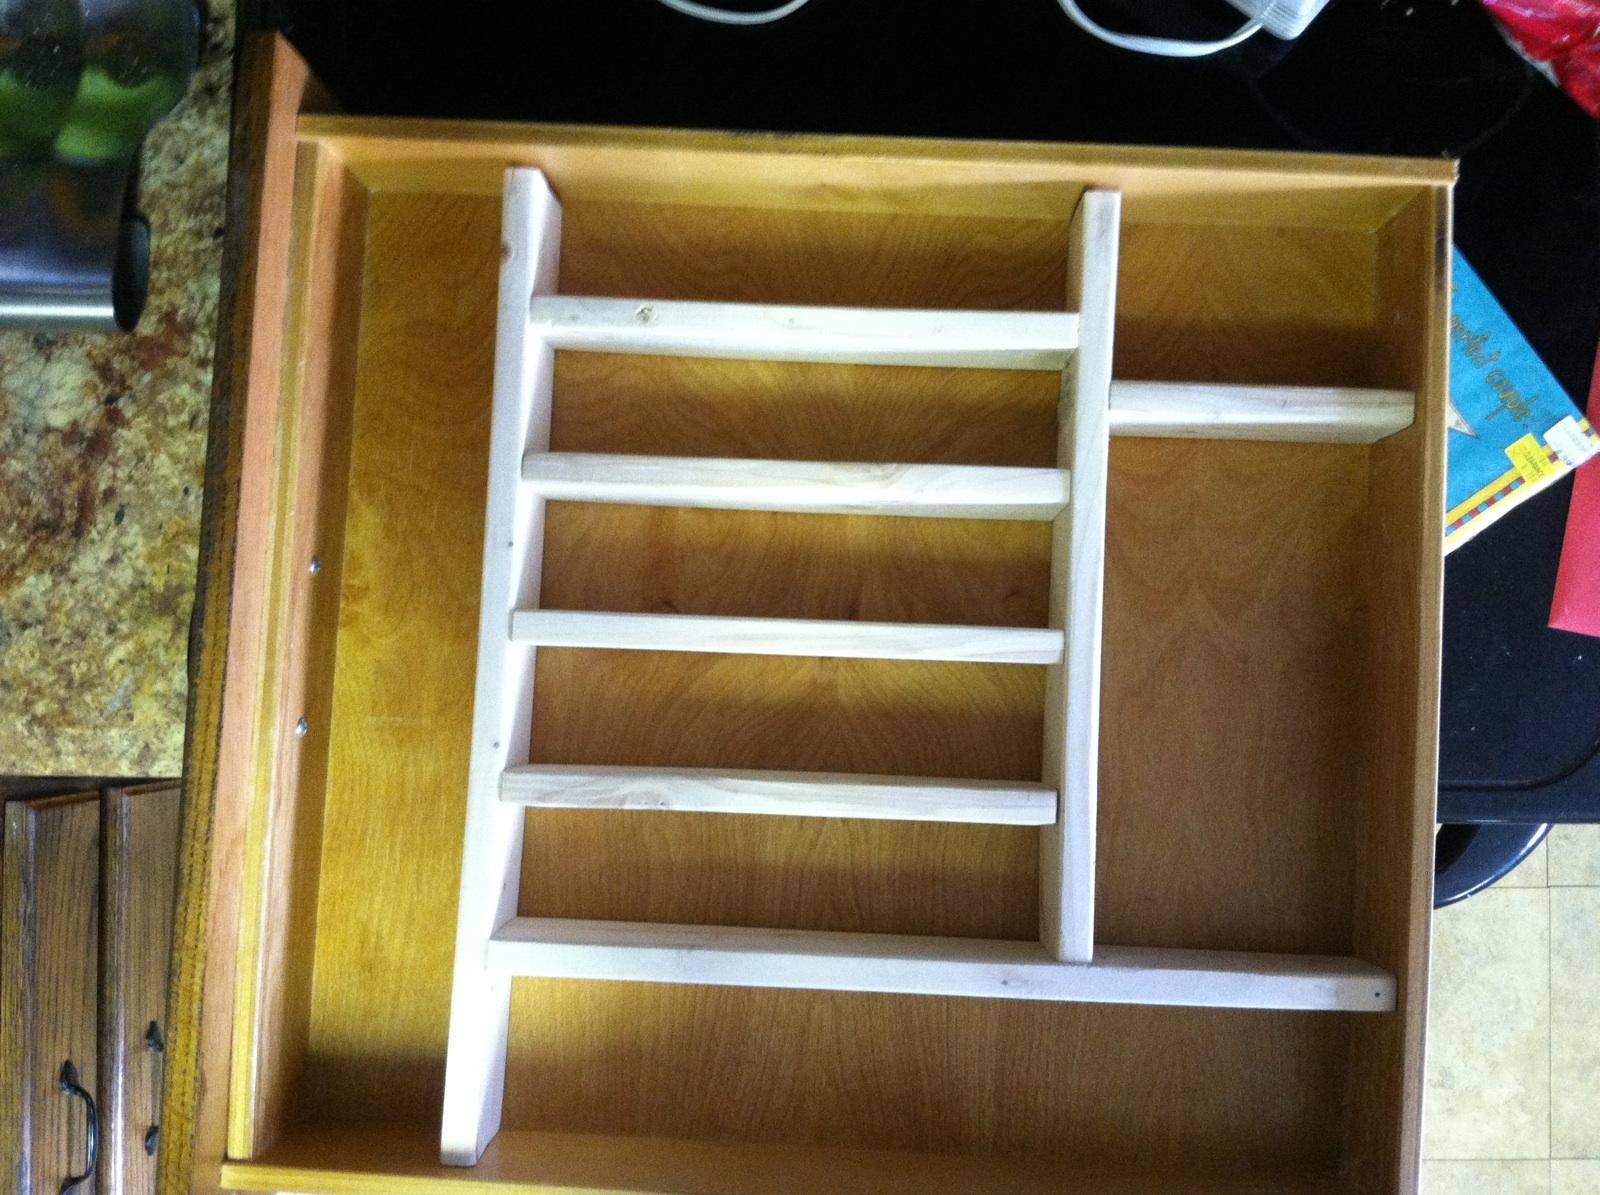 The Alabama Wife: Kitchen Drawer Organizers